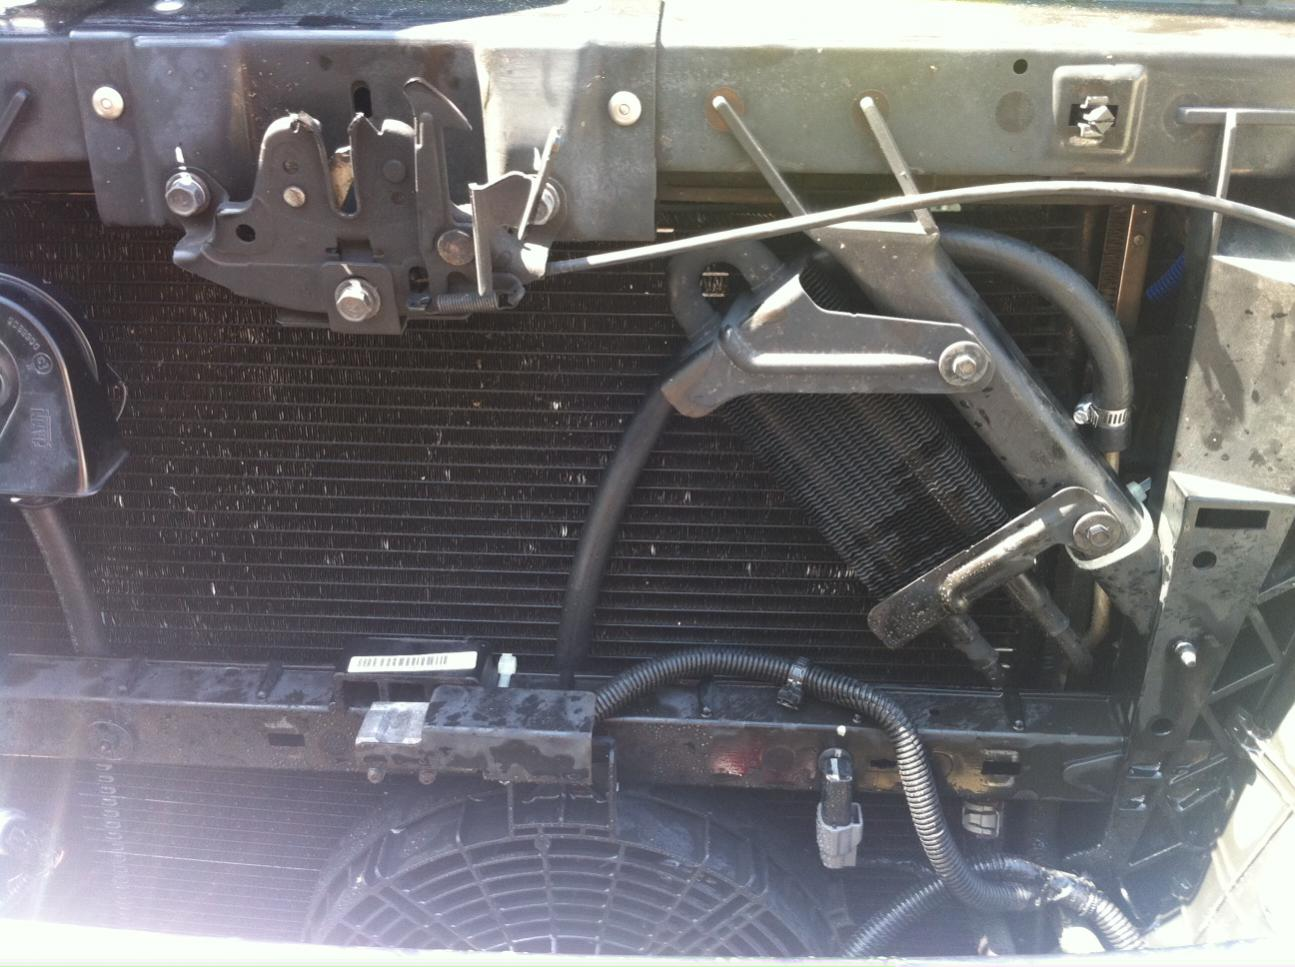 Radiator Bypassed Transmission Fluid Nissan Titan Forum